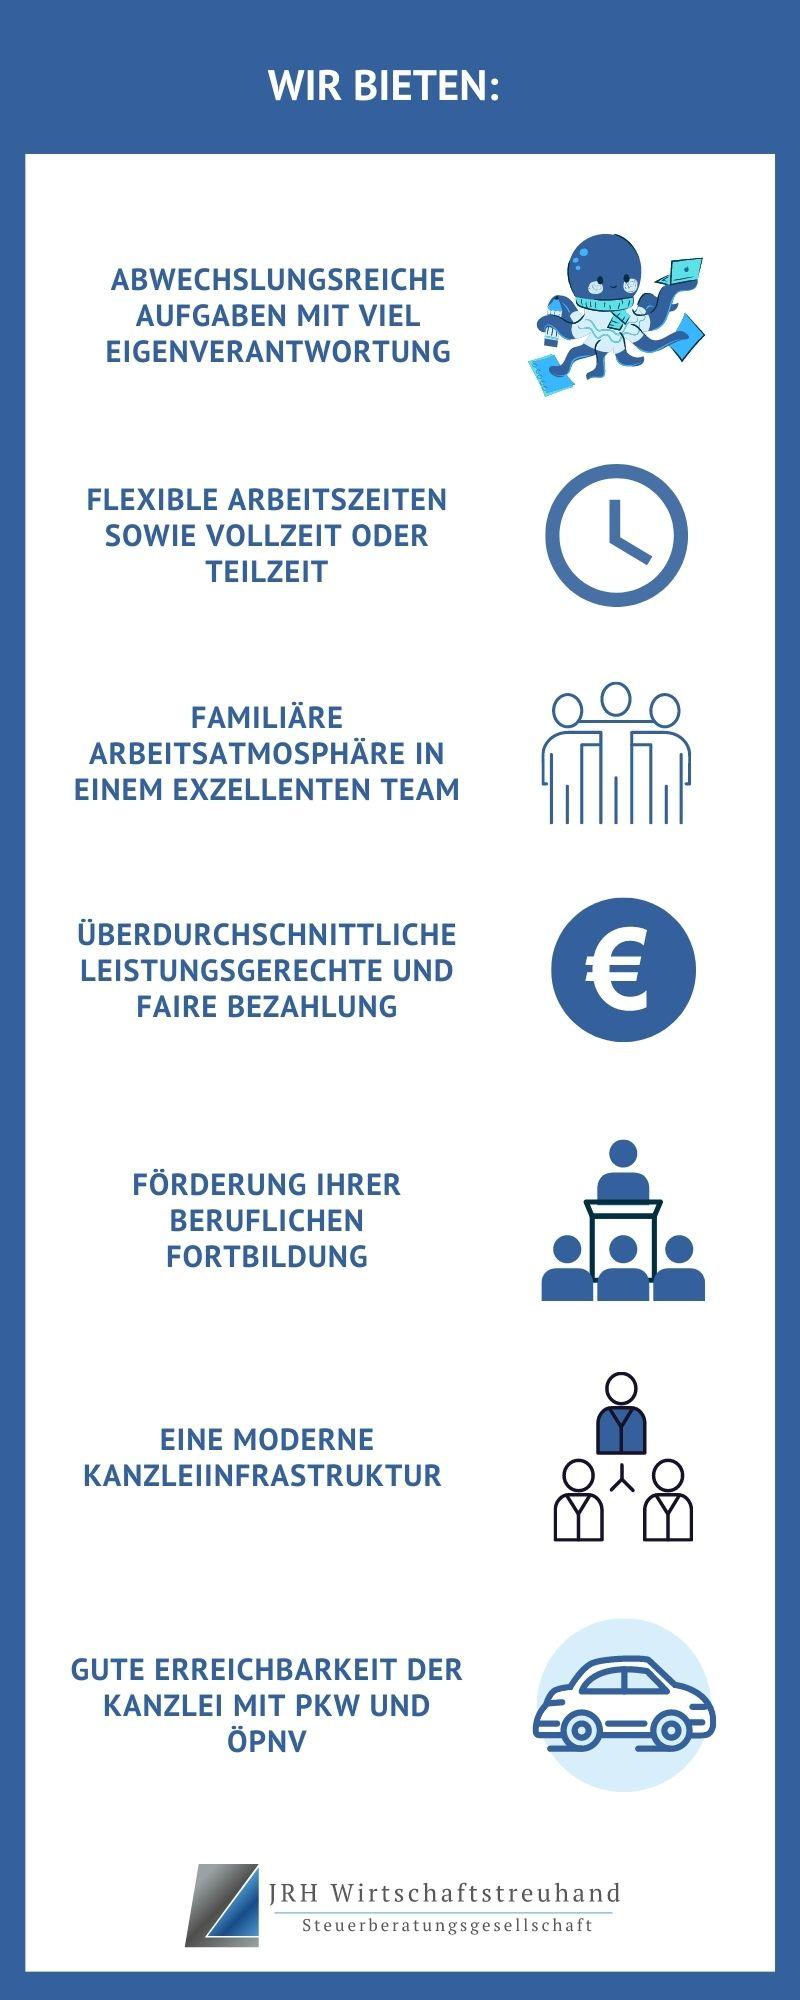 Infografik Stellenangebot: Was wir Bewerber/innen bieten